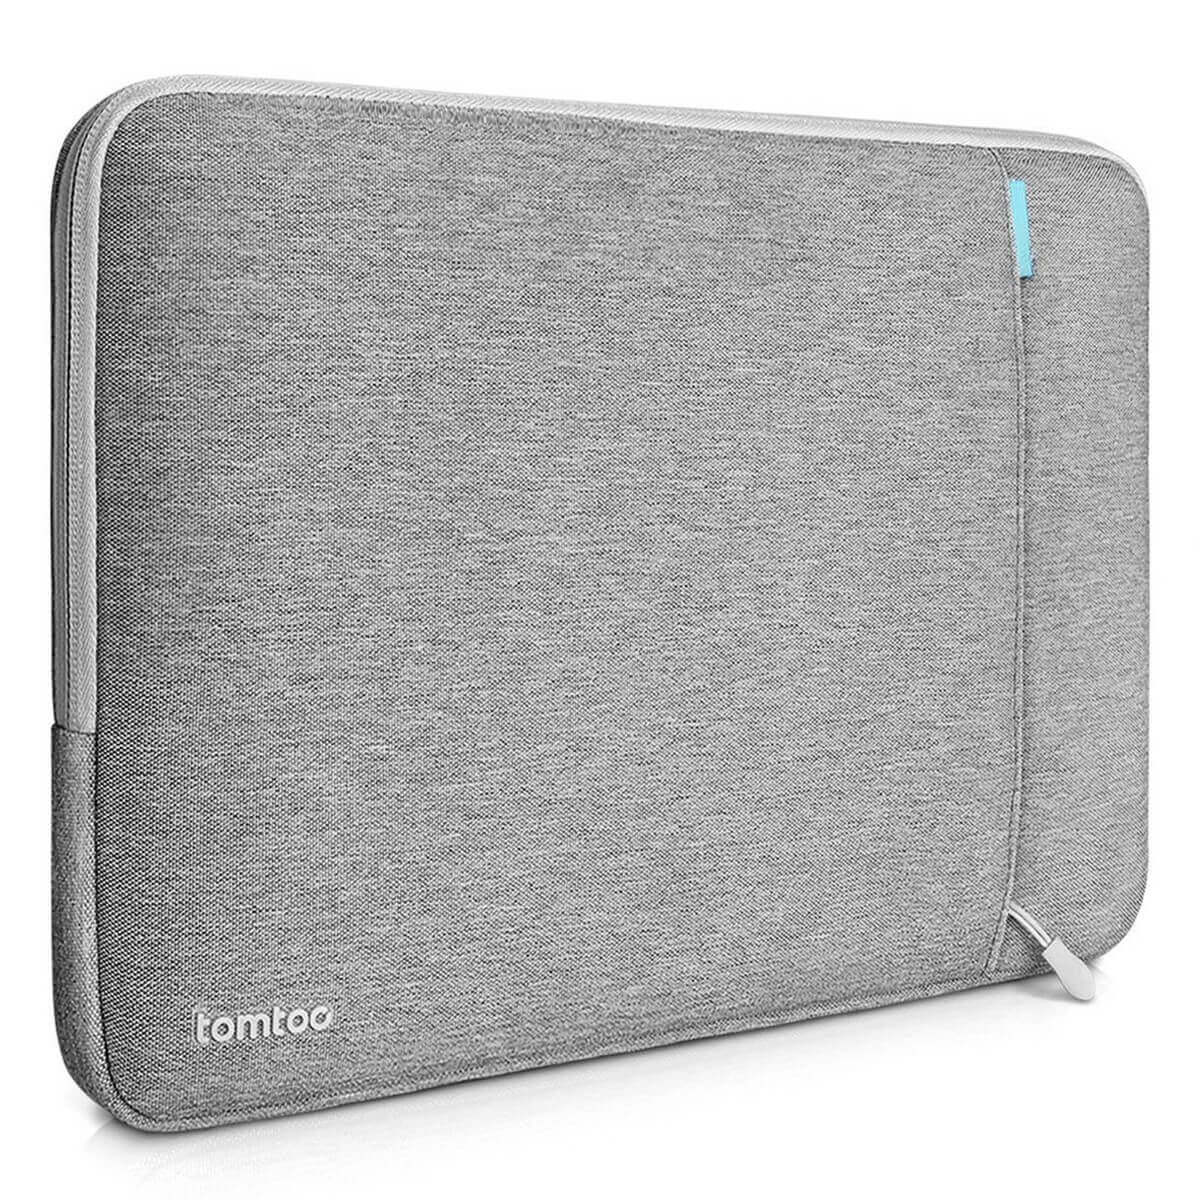 3 Tomtoc laptop sleeve Best MacBook Air Accessories